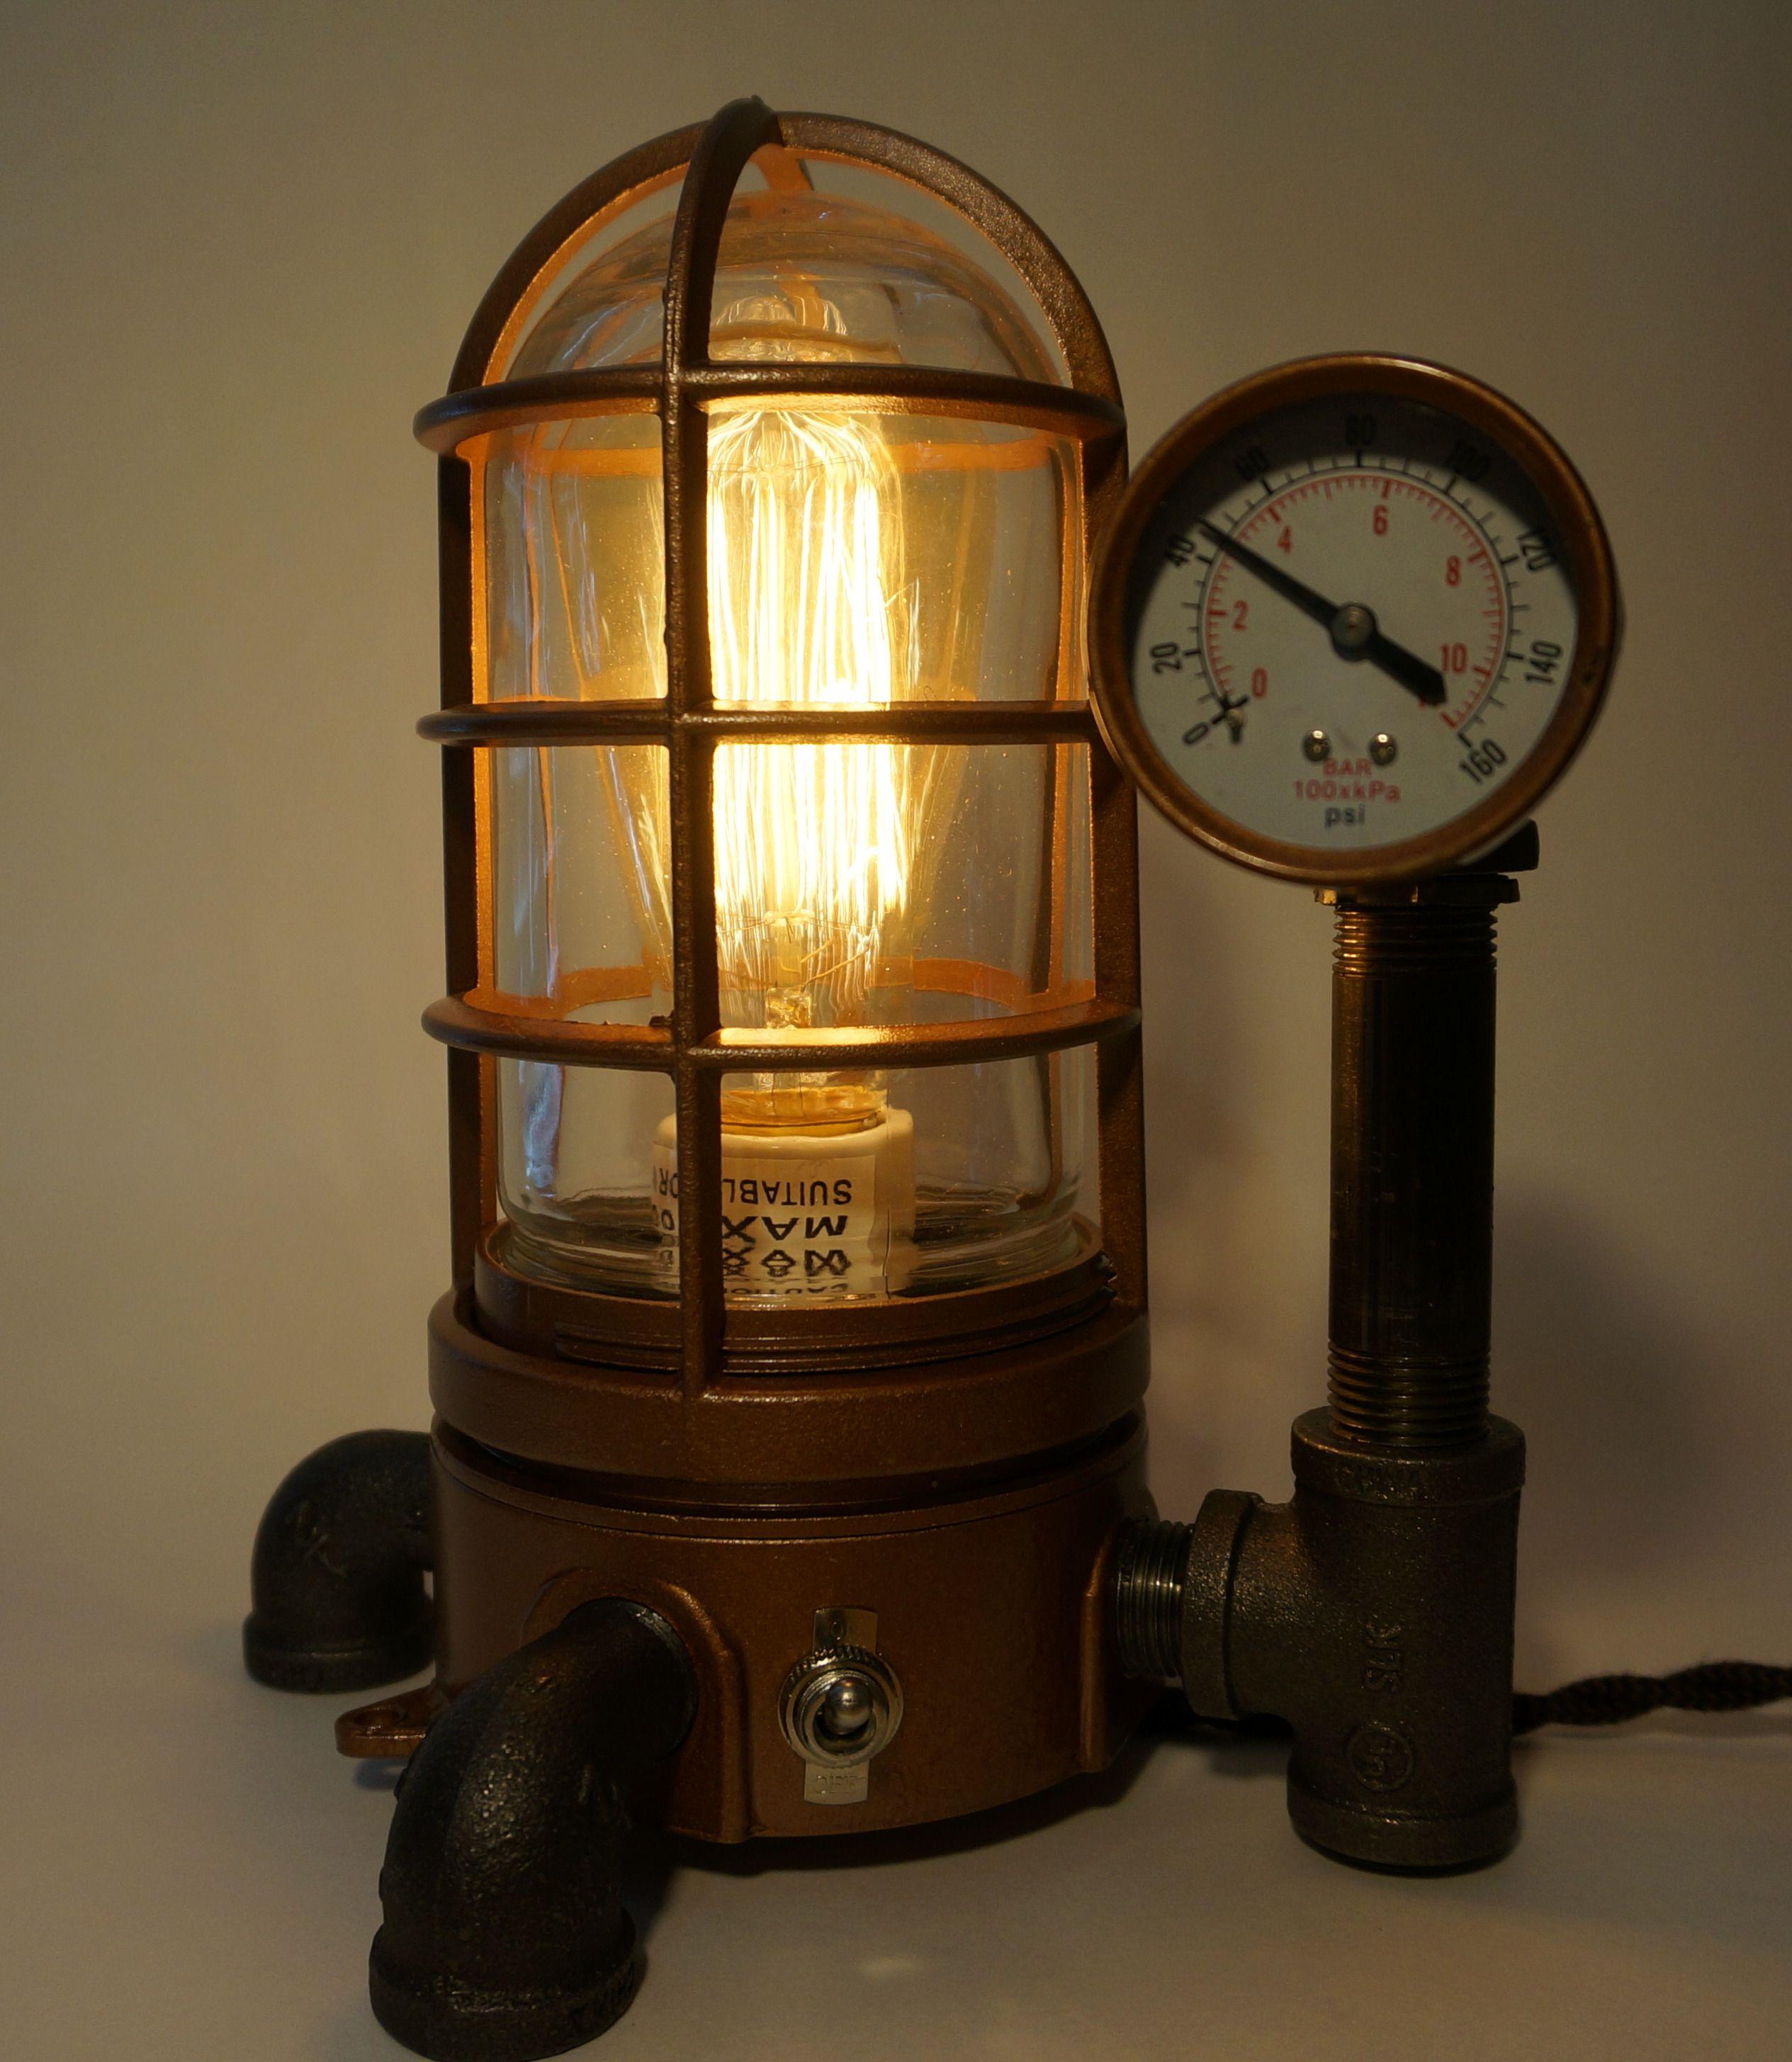 Steampunk Vapor Proof Desk Lamp #43 - SteamLit   Steampunk Bedroom ...